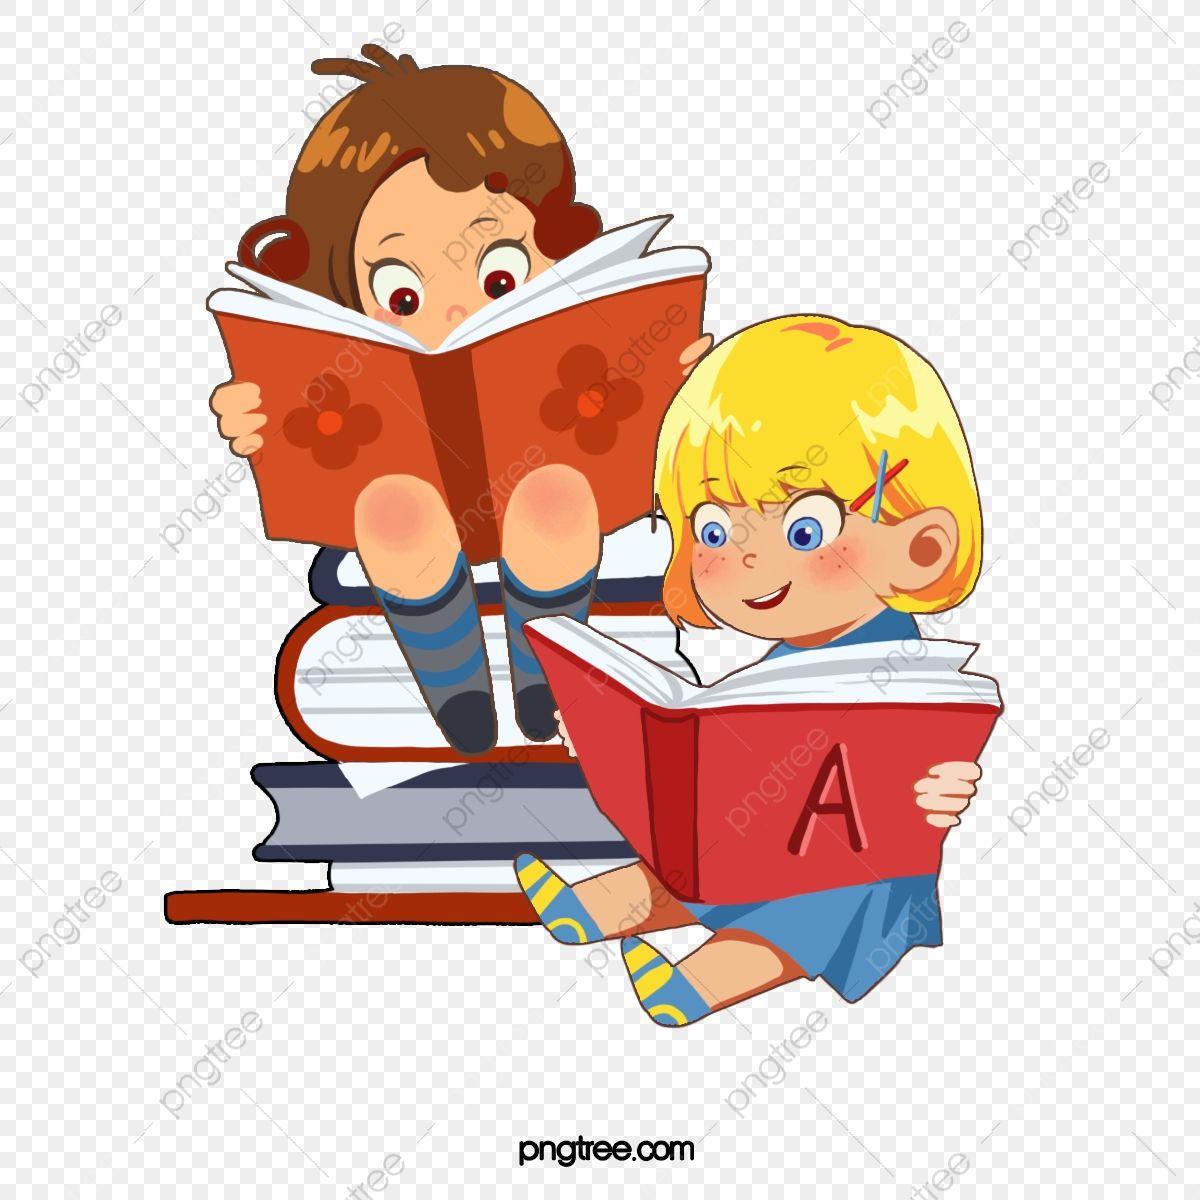 62 Gambar Kartun Anak Membaca Hd Terbaik Kids Cartoon Characters Kids Reading Books Cartoon Images